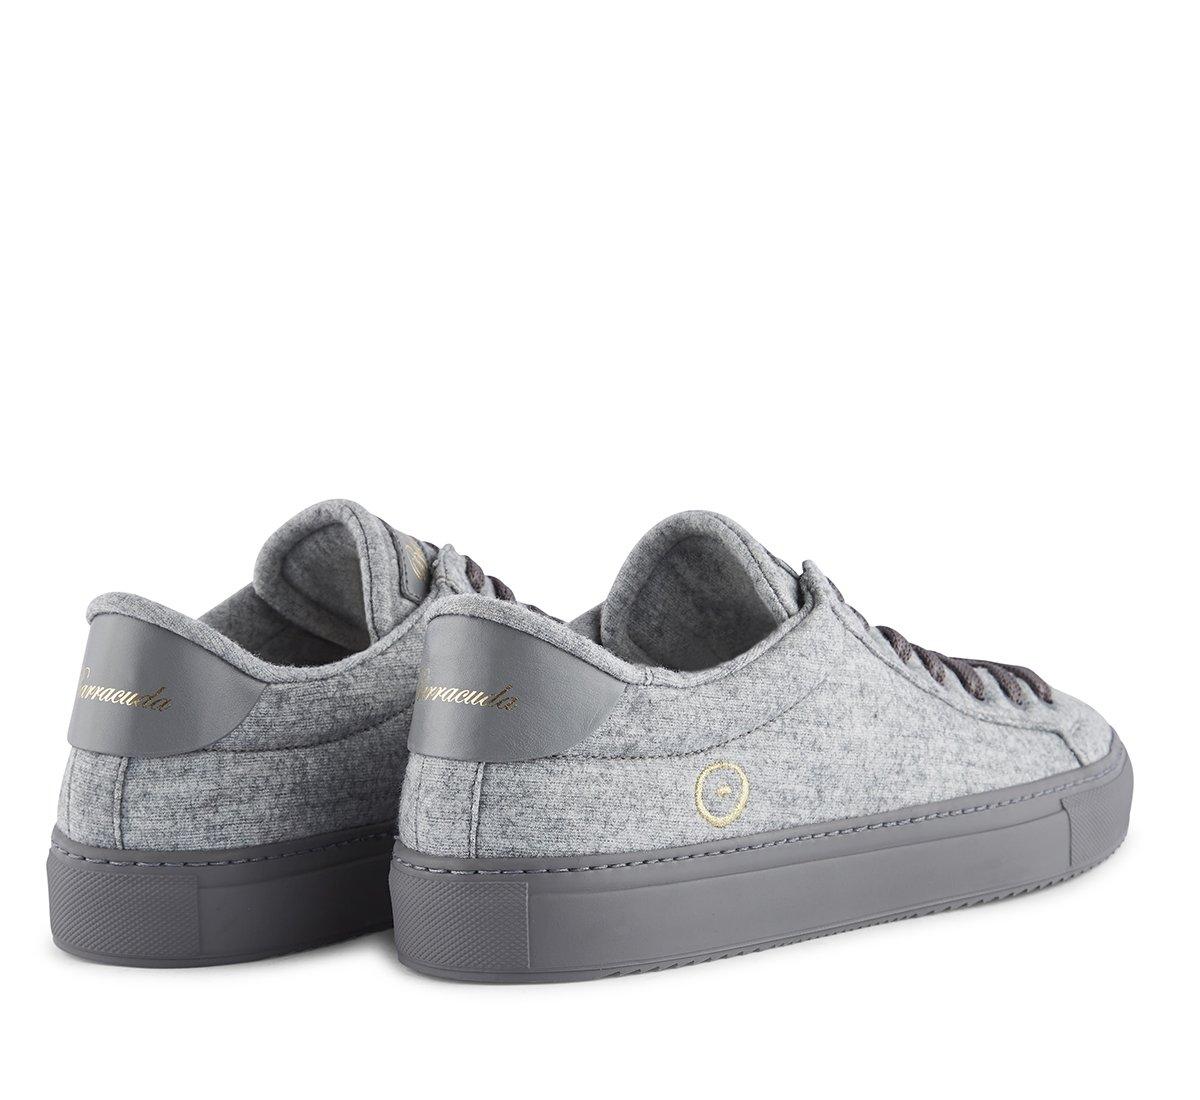 Breathable/dry sneaker by Reda Active Merino Wool